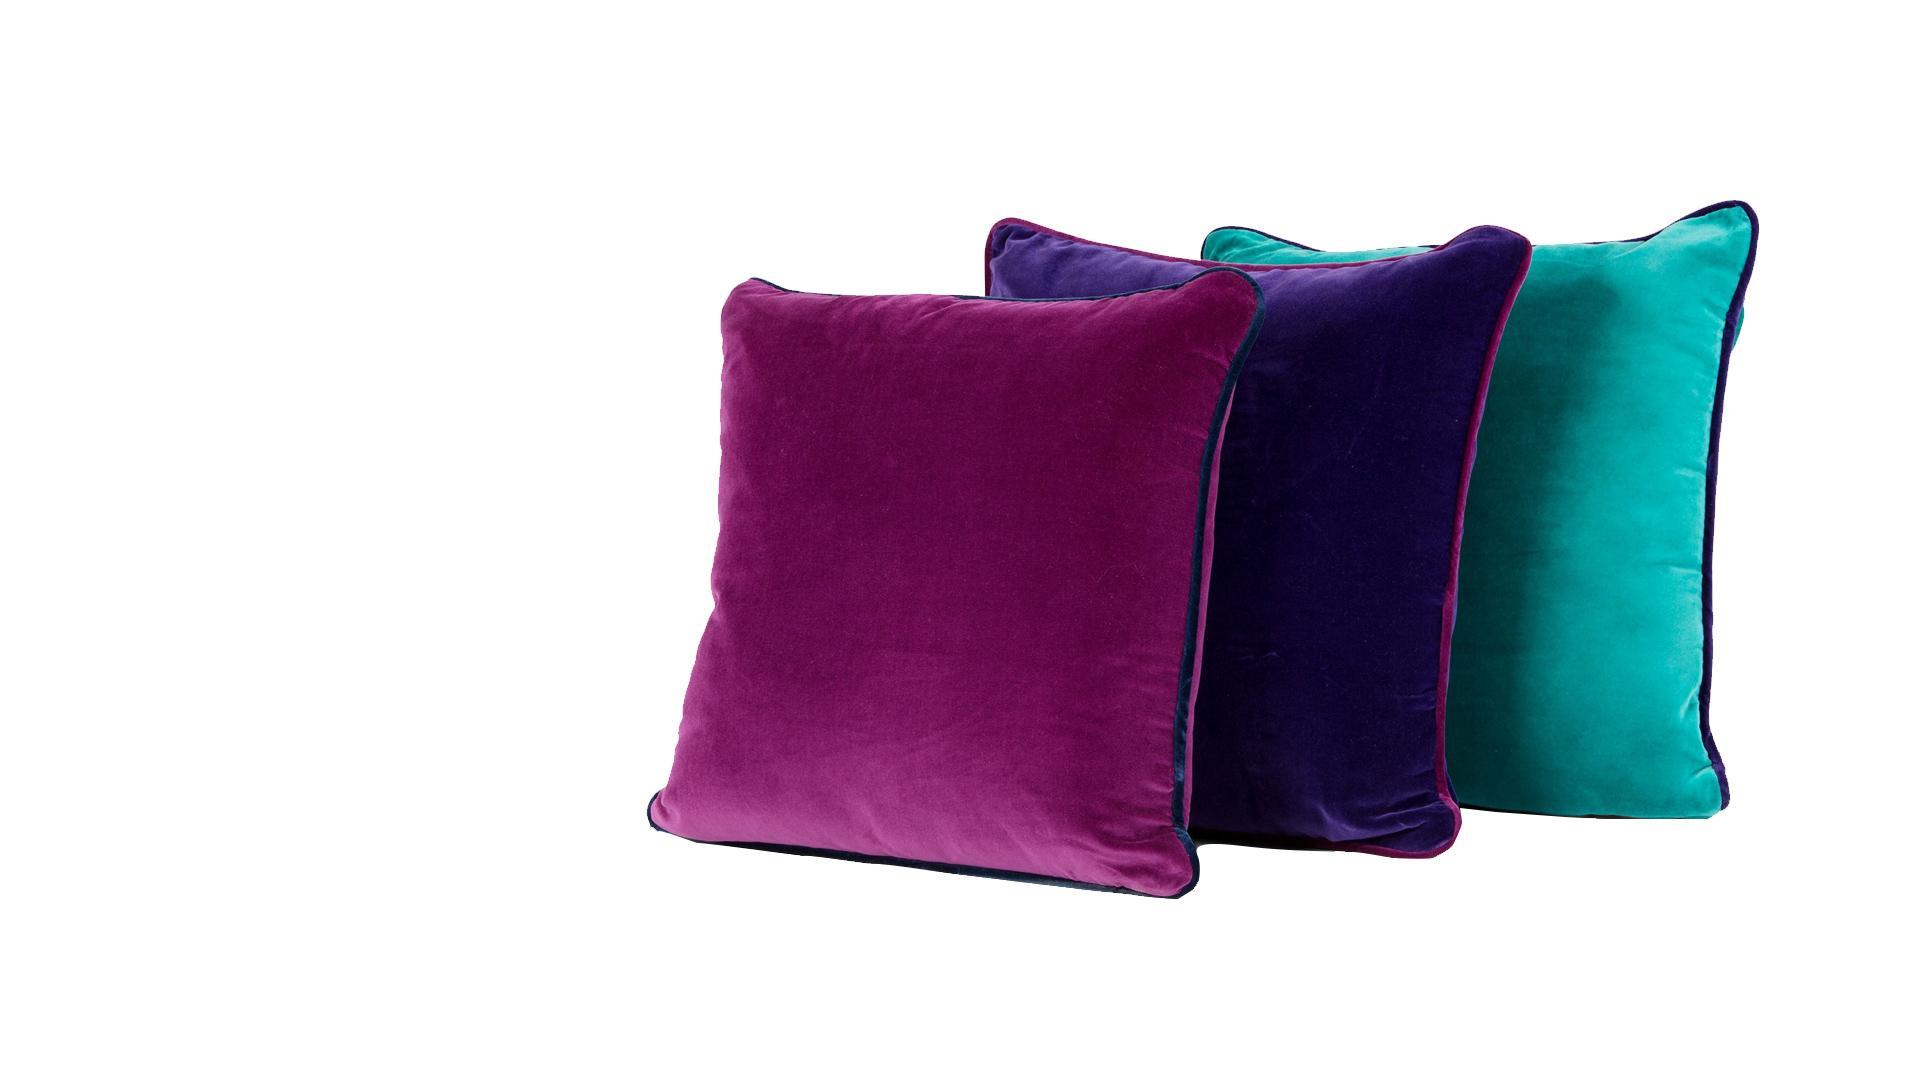 Mya Cushions - Celebrity Big Brother Summer